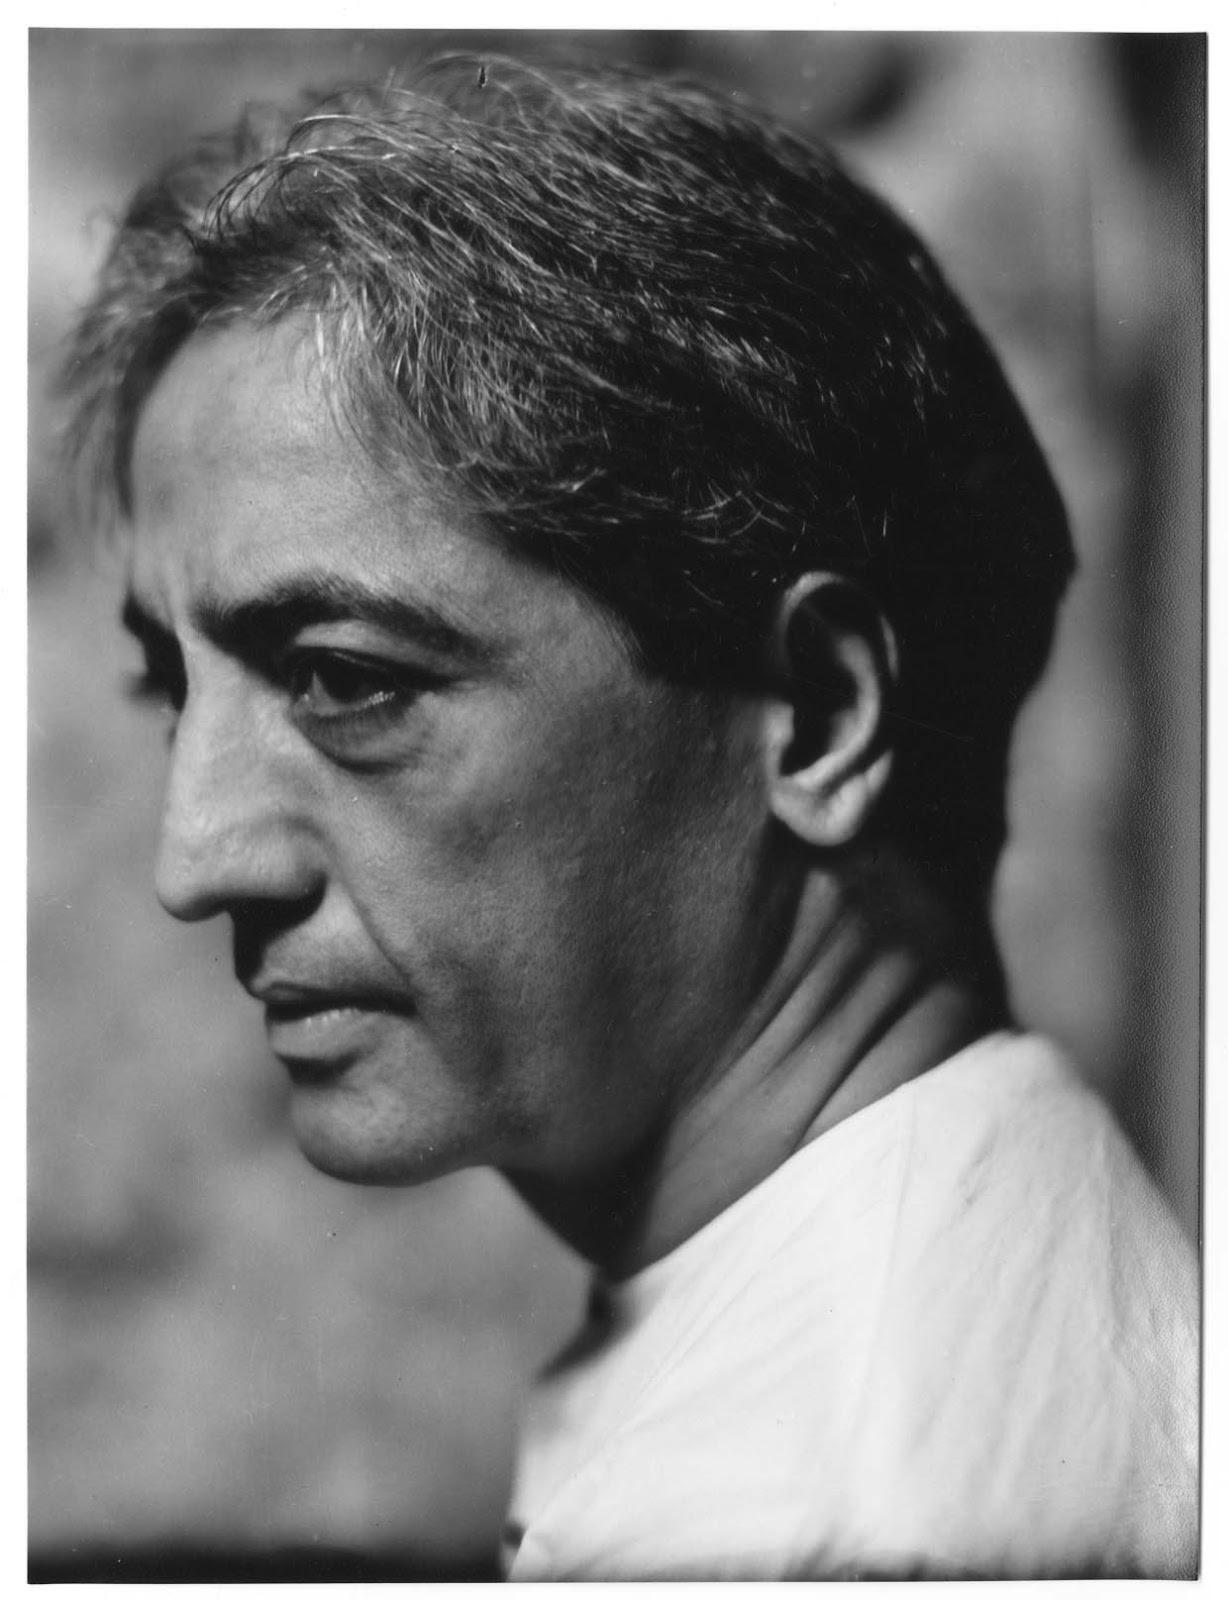 Acabar con todo el miedo - Jiddu Krishnamurti